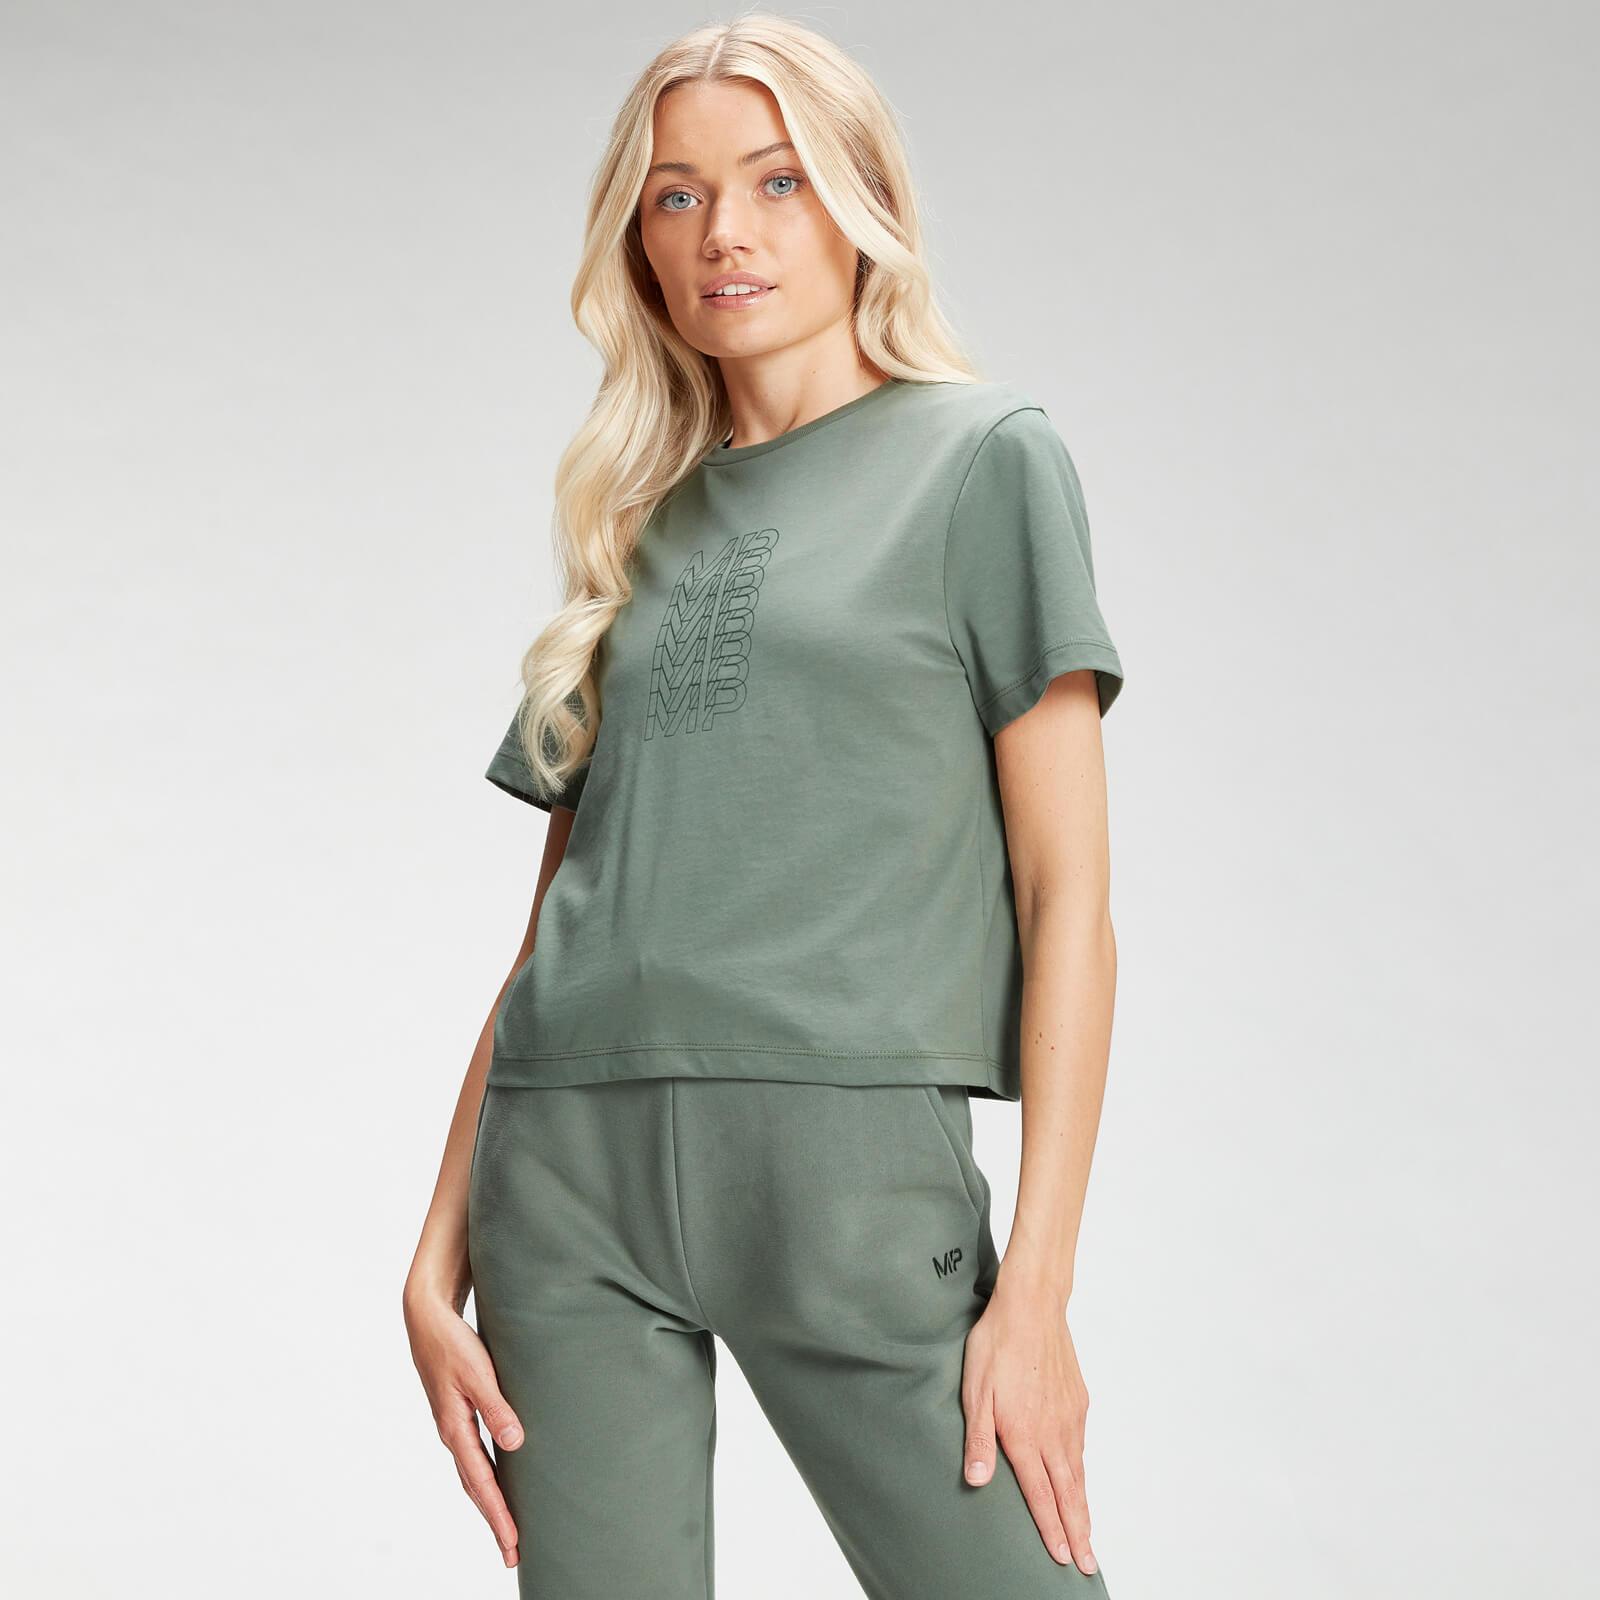 Купить MP Women's Repeat MP Crop T-Shirt - Cactus - XXL, Myprotein International